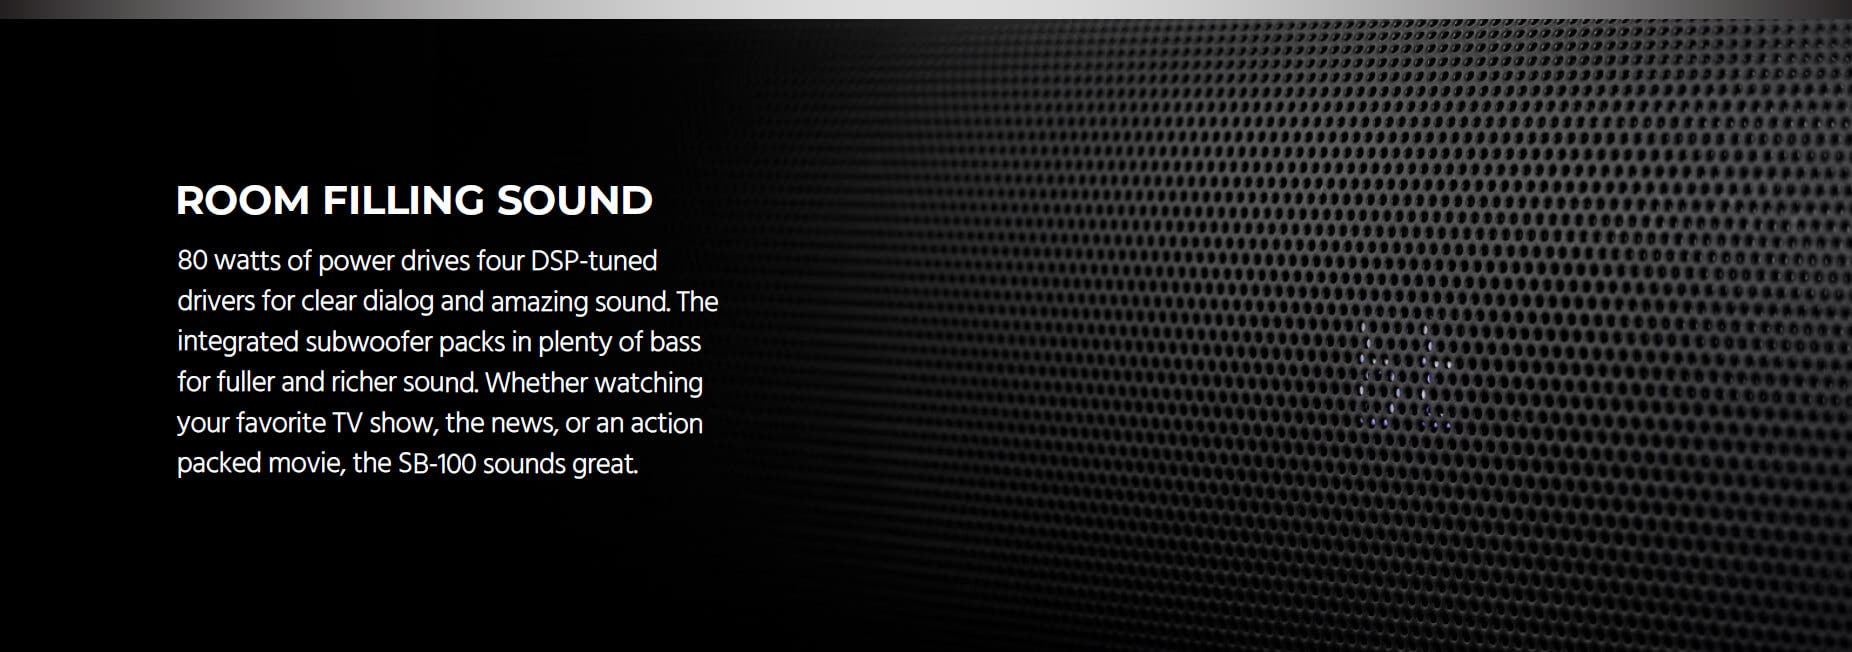 SB-100 Soundbar